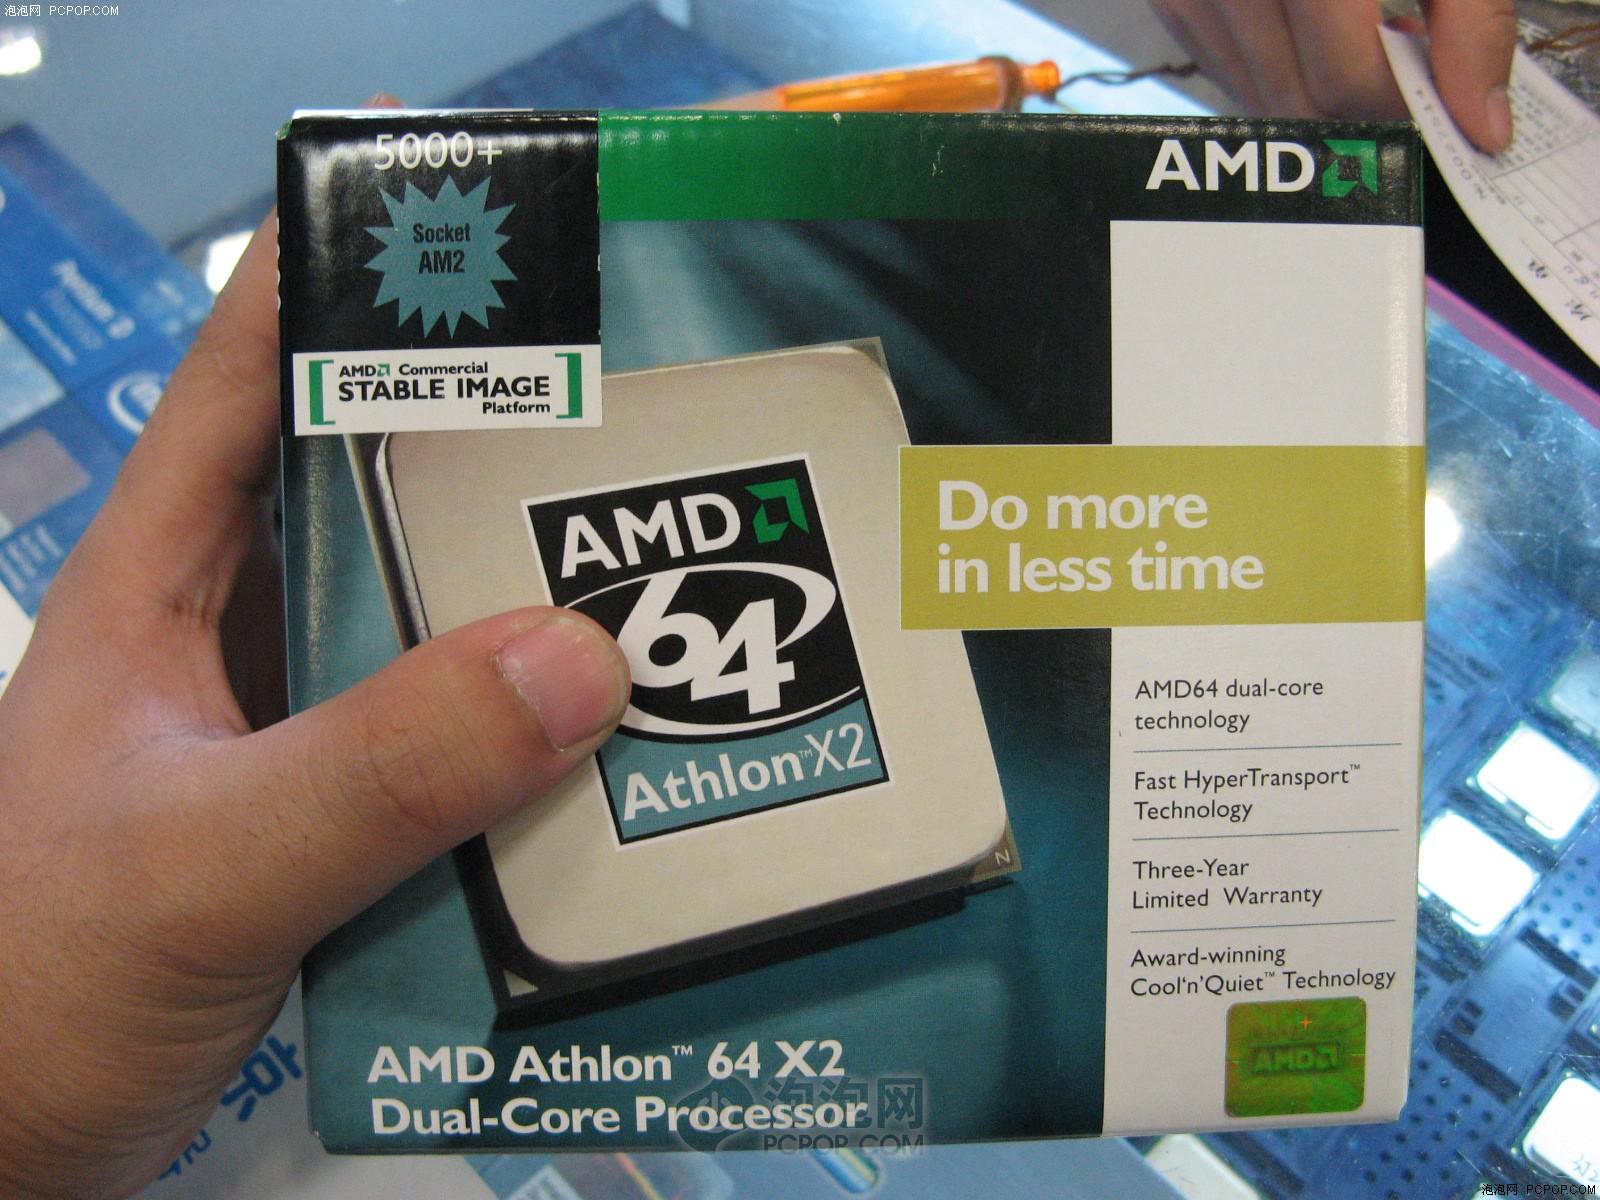 intel疯涨不厚道 且看amd四大天王cpu图片12 pcpop电脑时尚